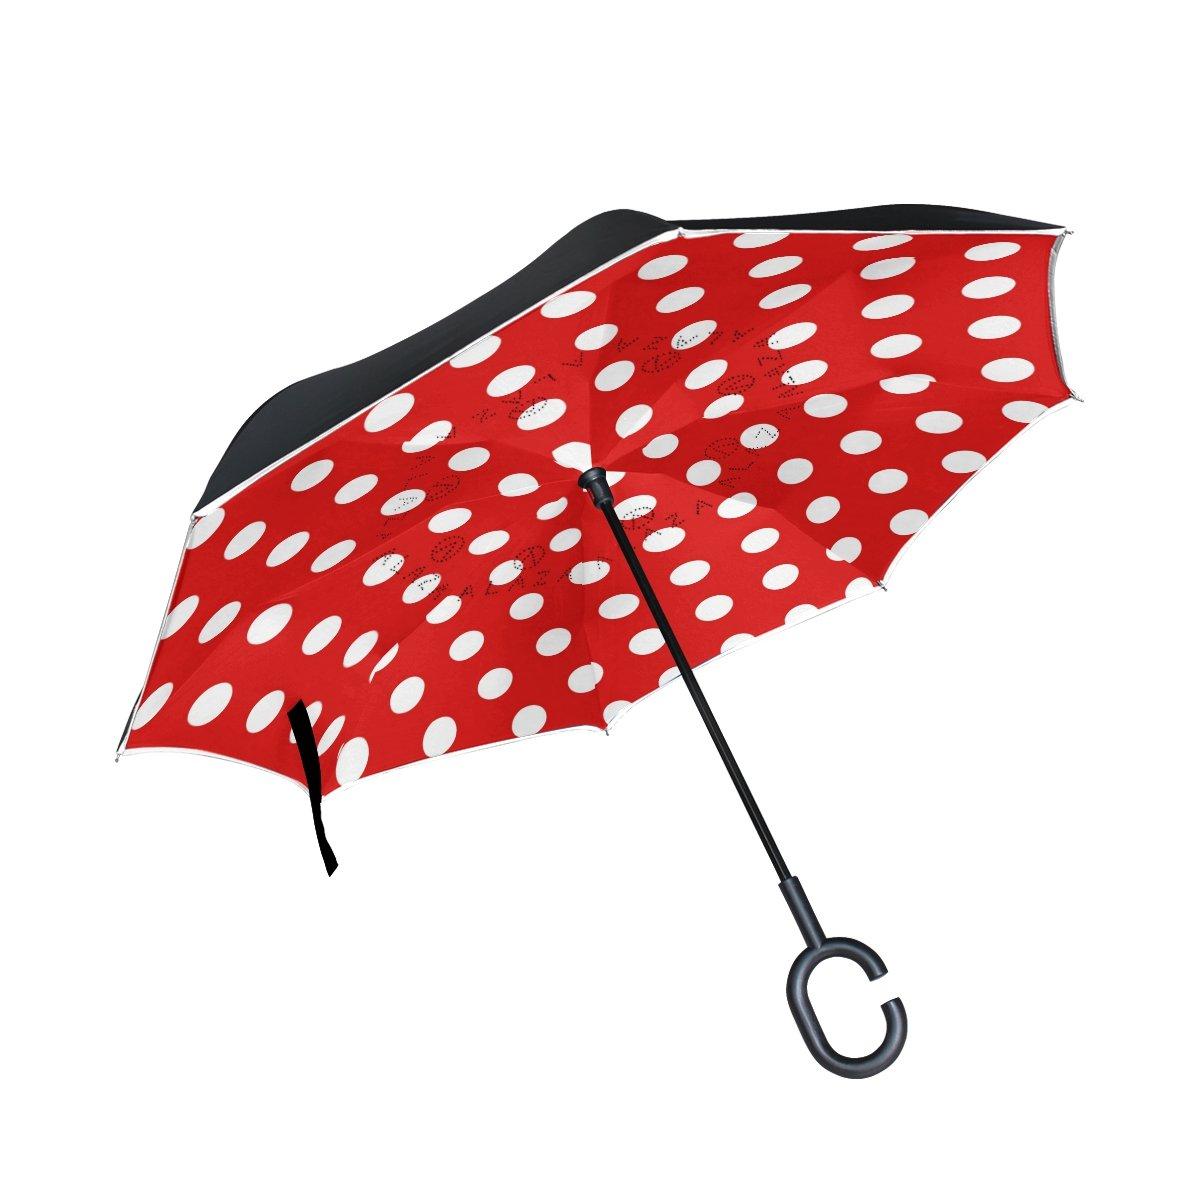 Amazon.com : ALAZA Stylish Red White Polka Dot Windproof UV.